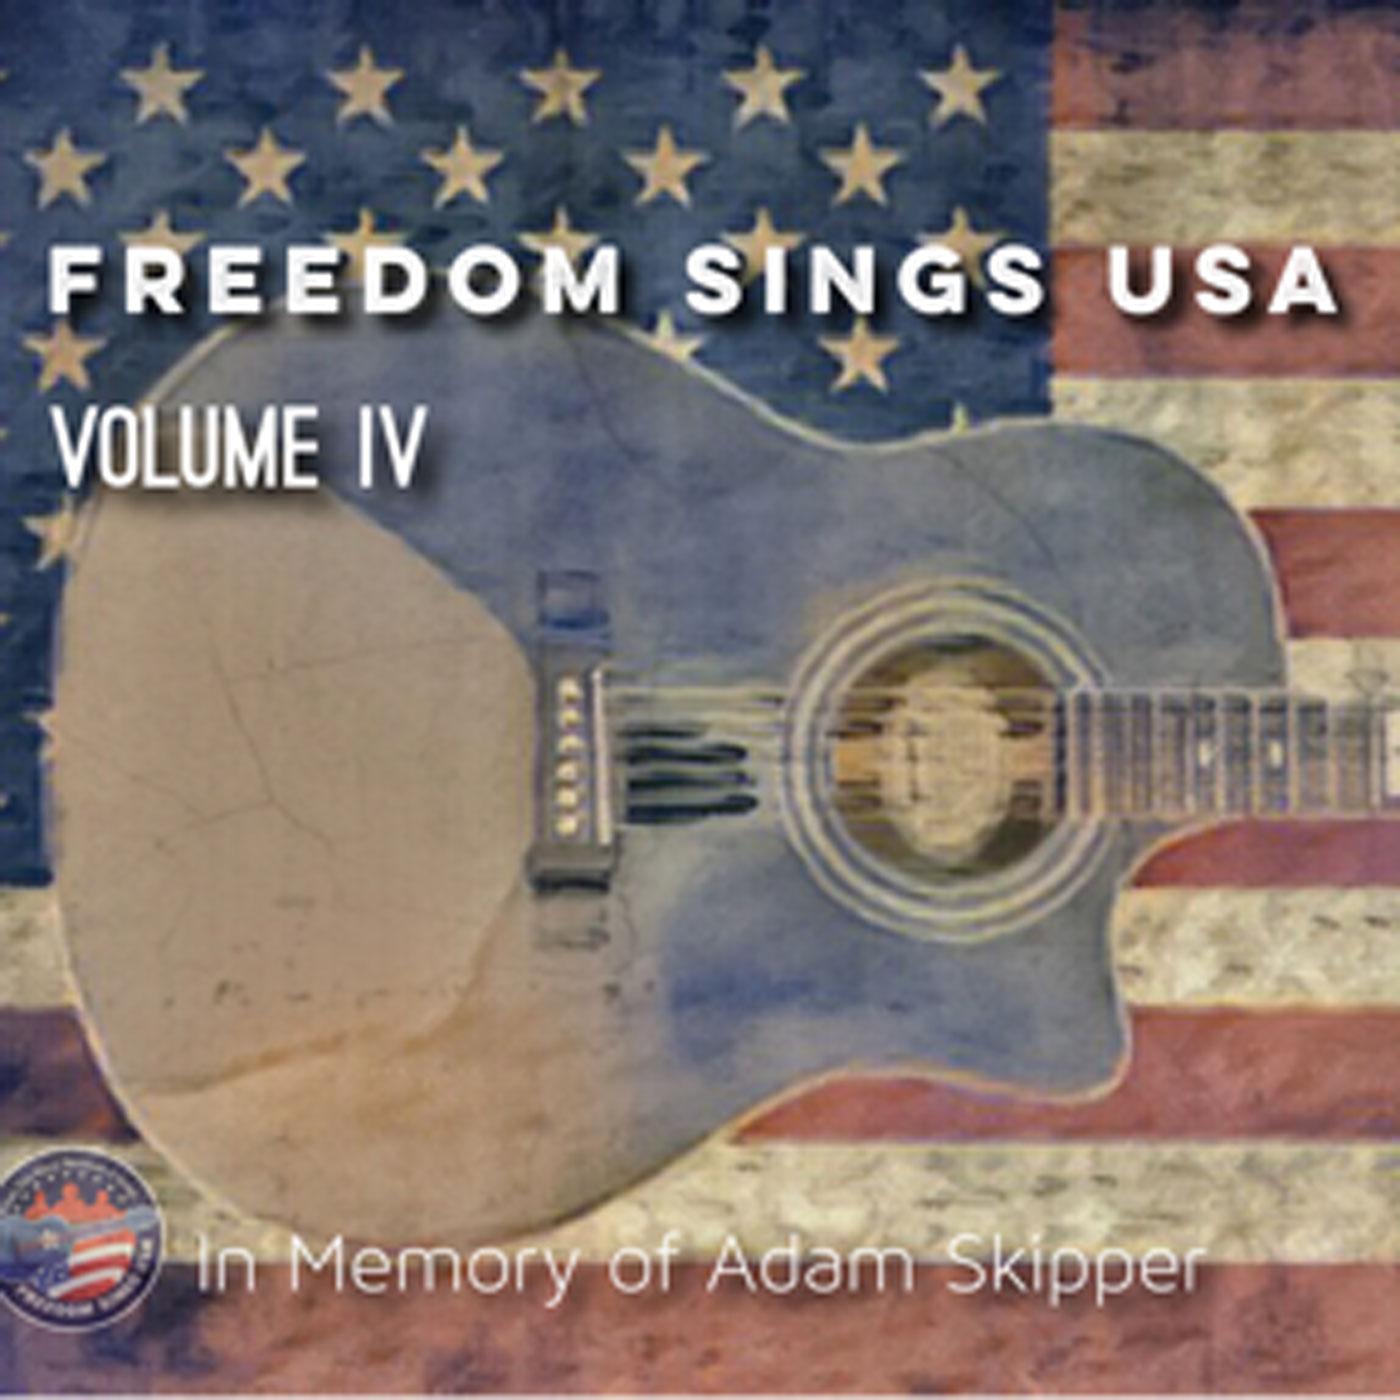 Freedom Sings USA Volume IV